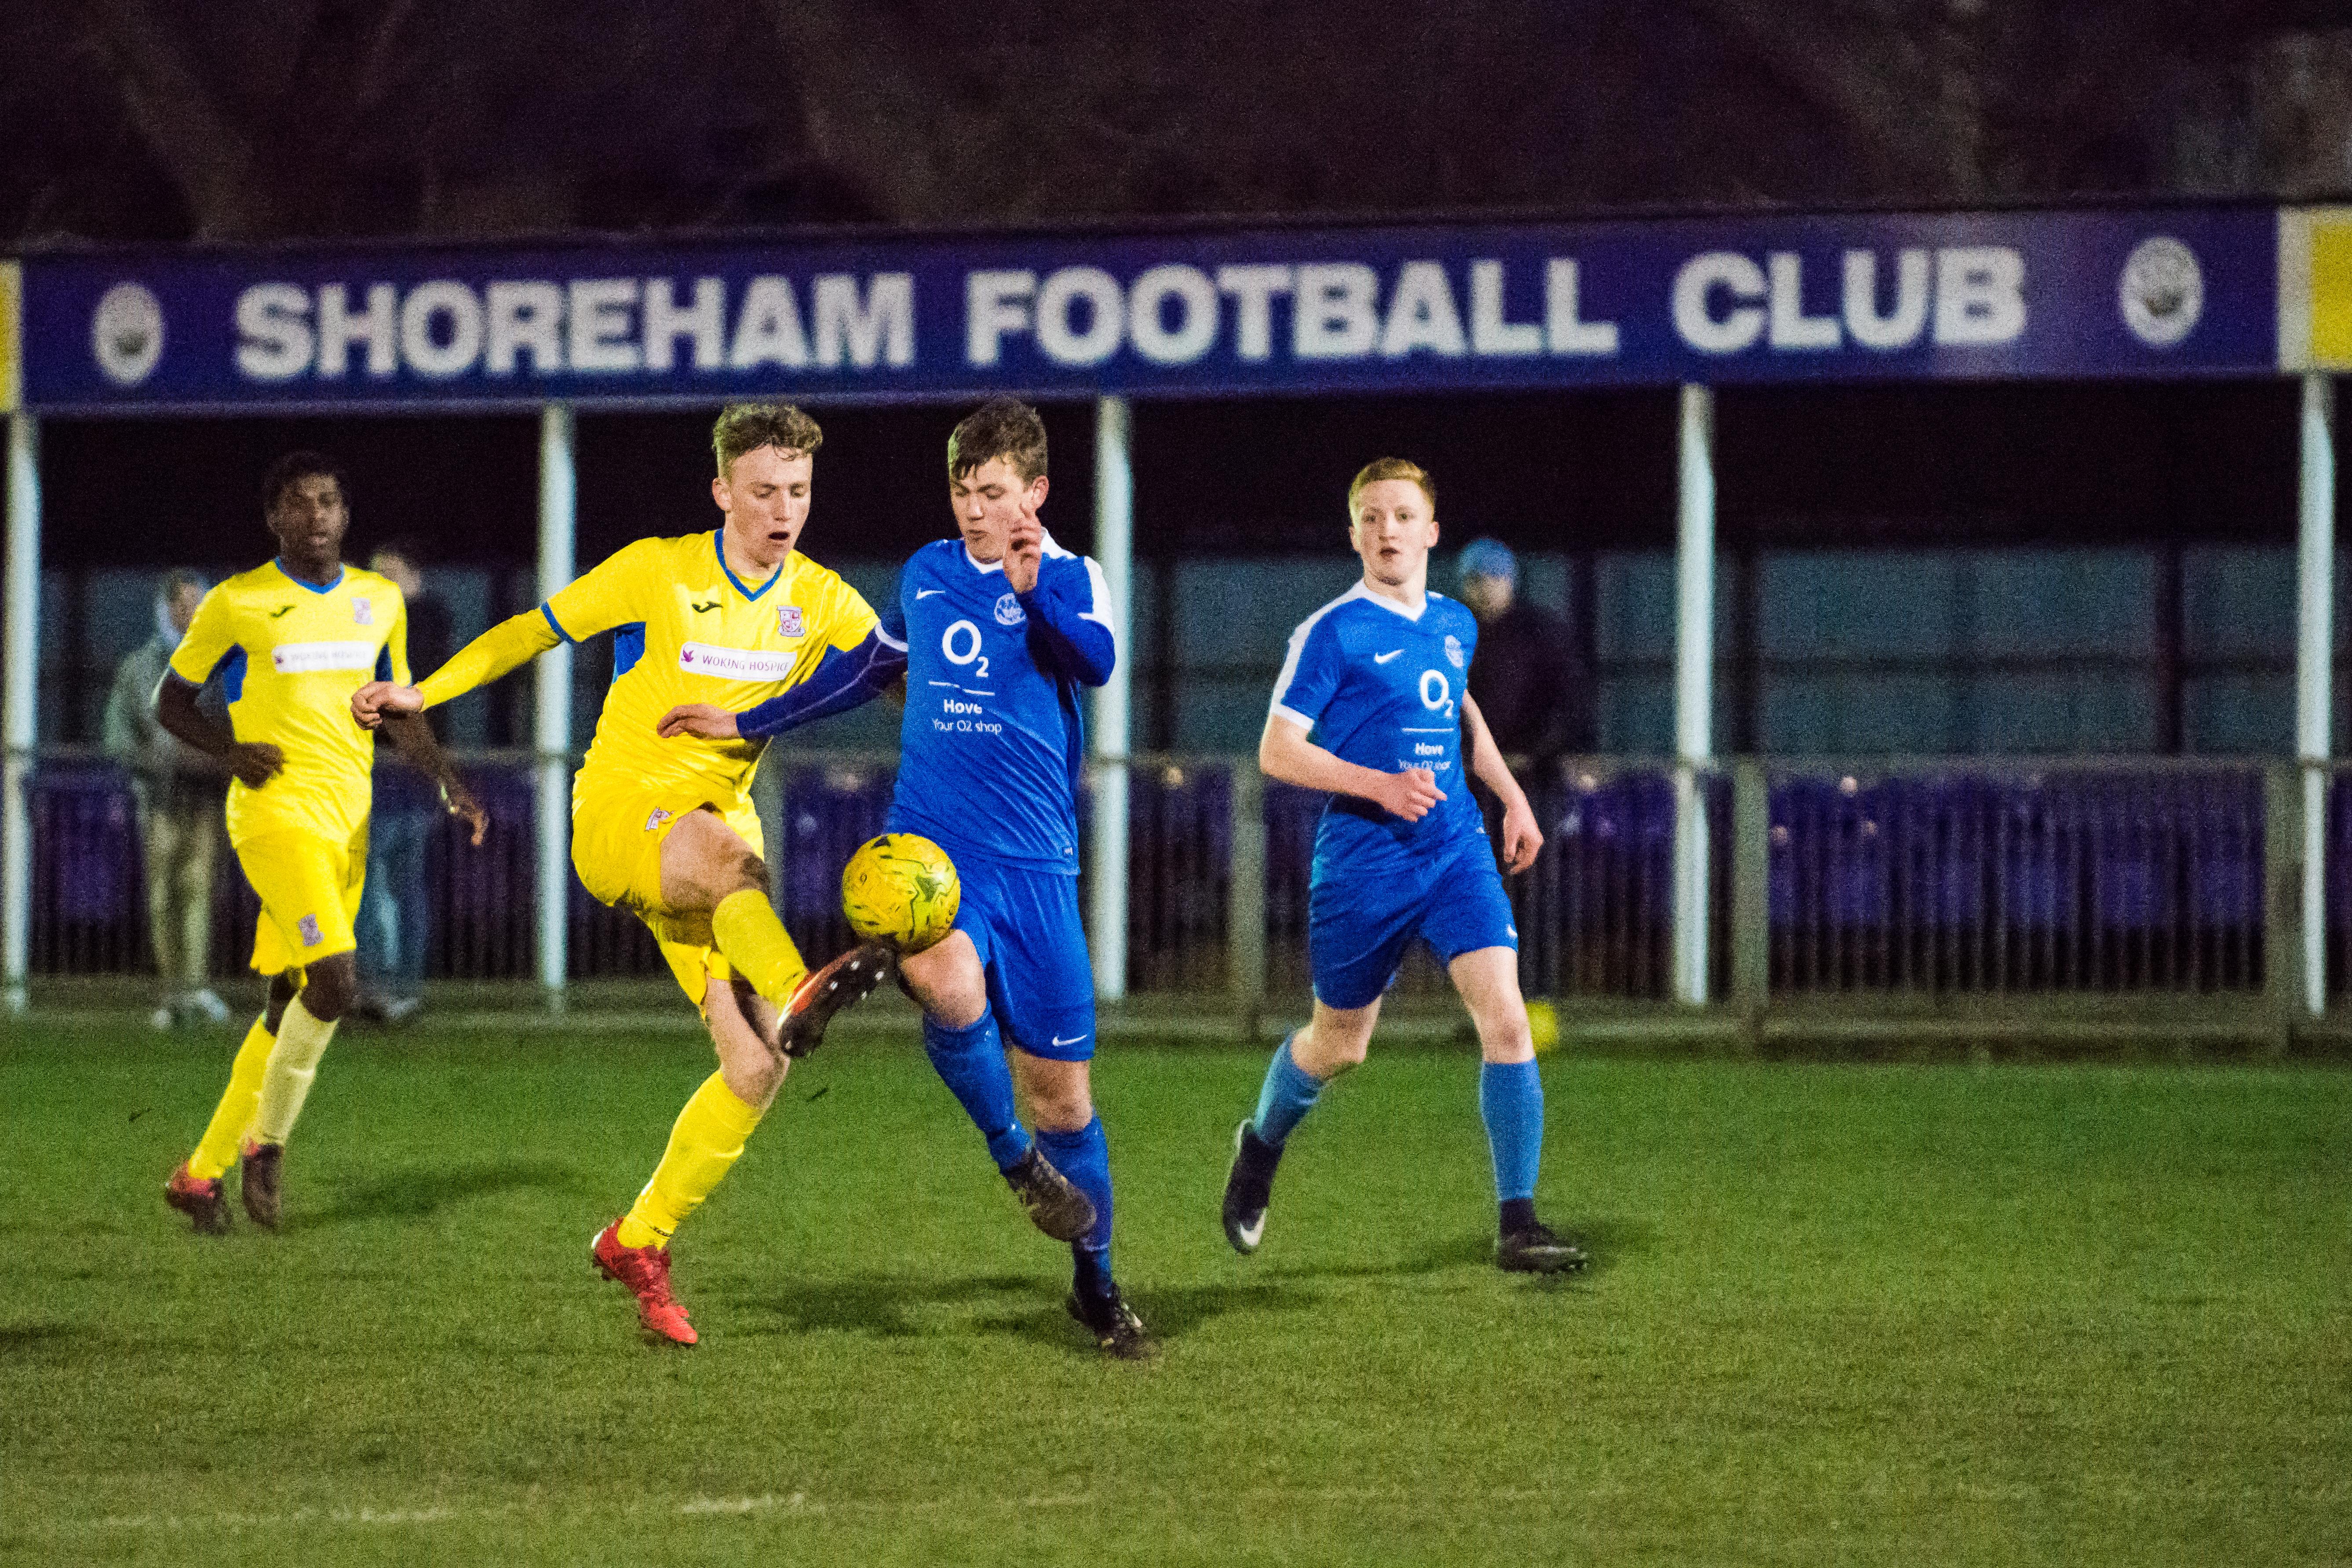 DAVID_JEFFERY Shoreham FC U18s vs Woking FC Academy 22.03.18 72